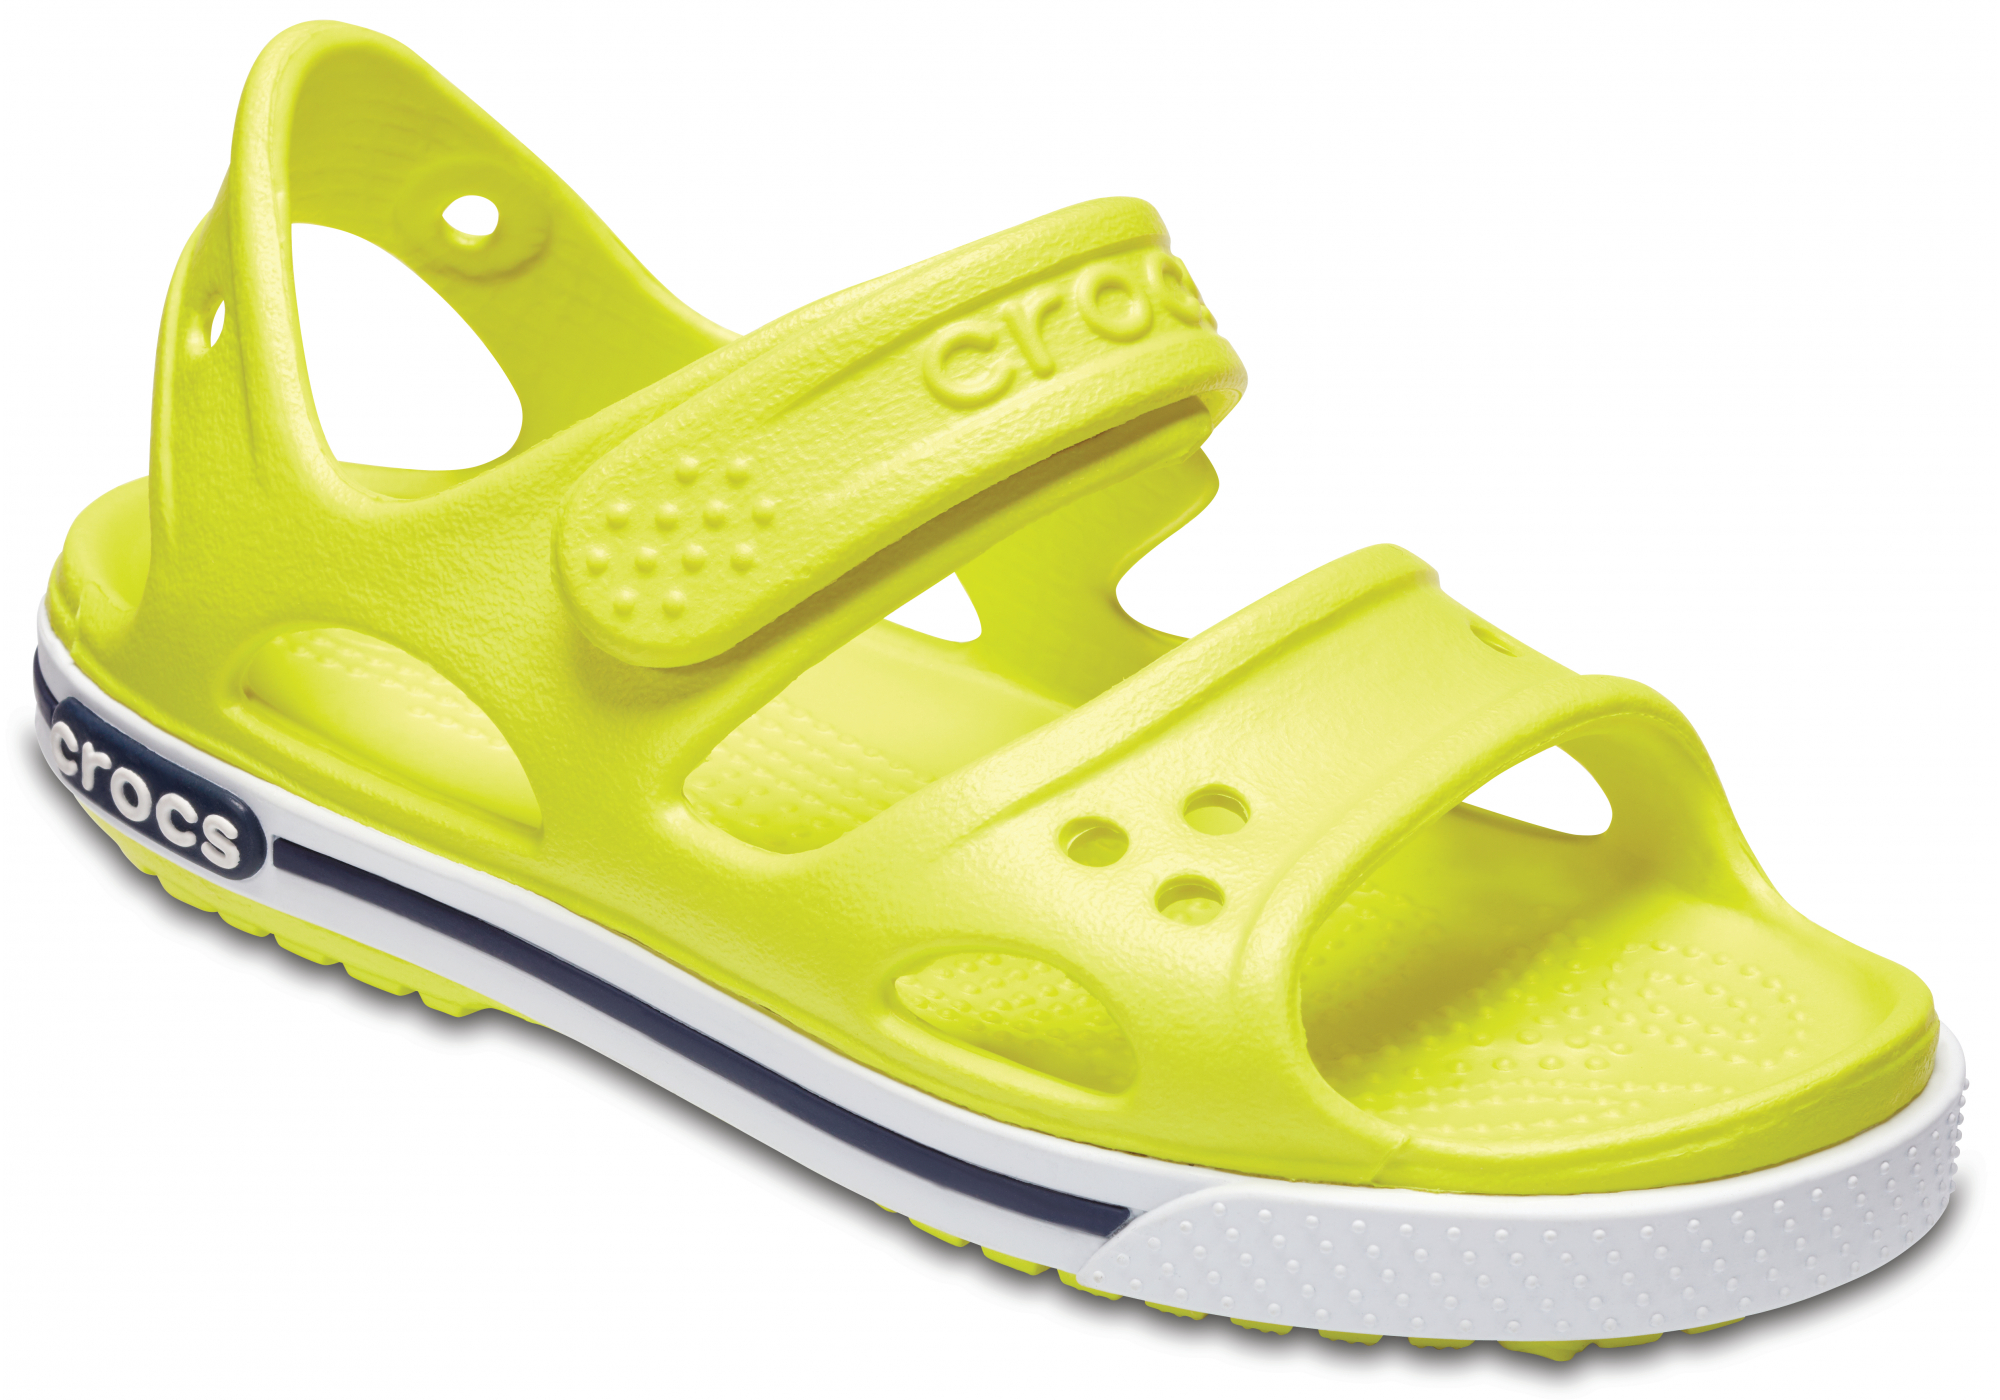 dětské sandály Crocs Crocband II Sandal  f7b7b6b9d61